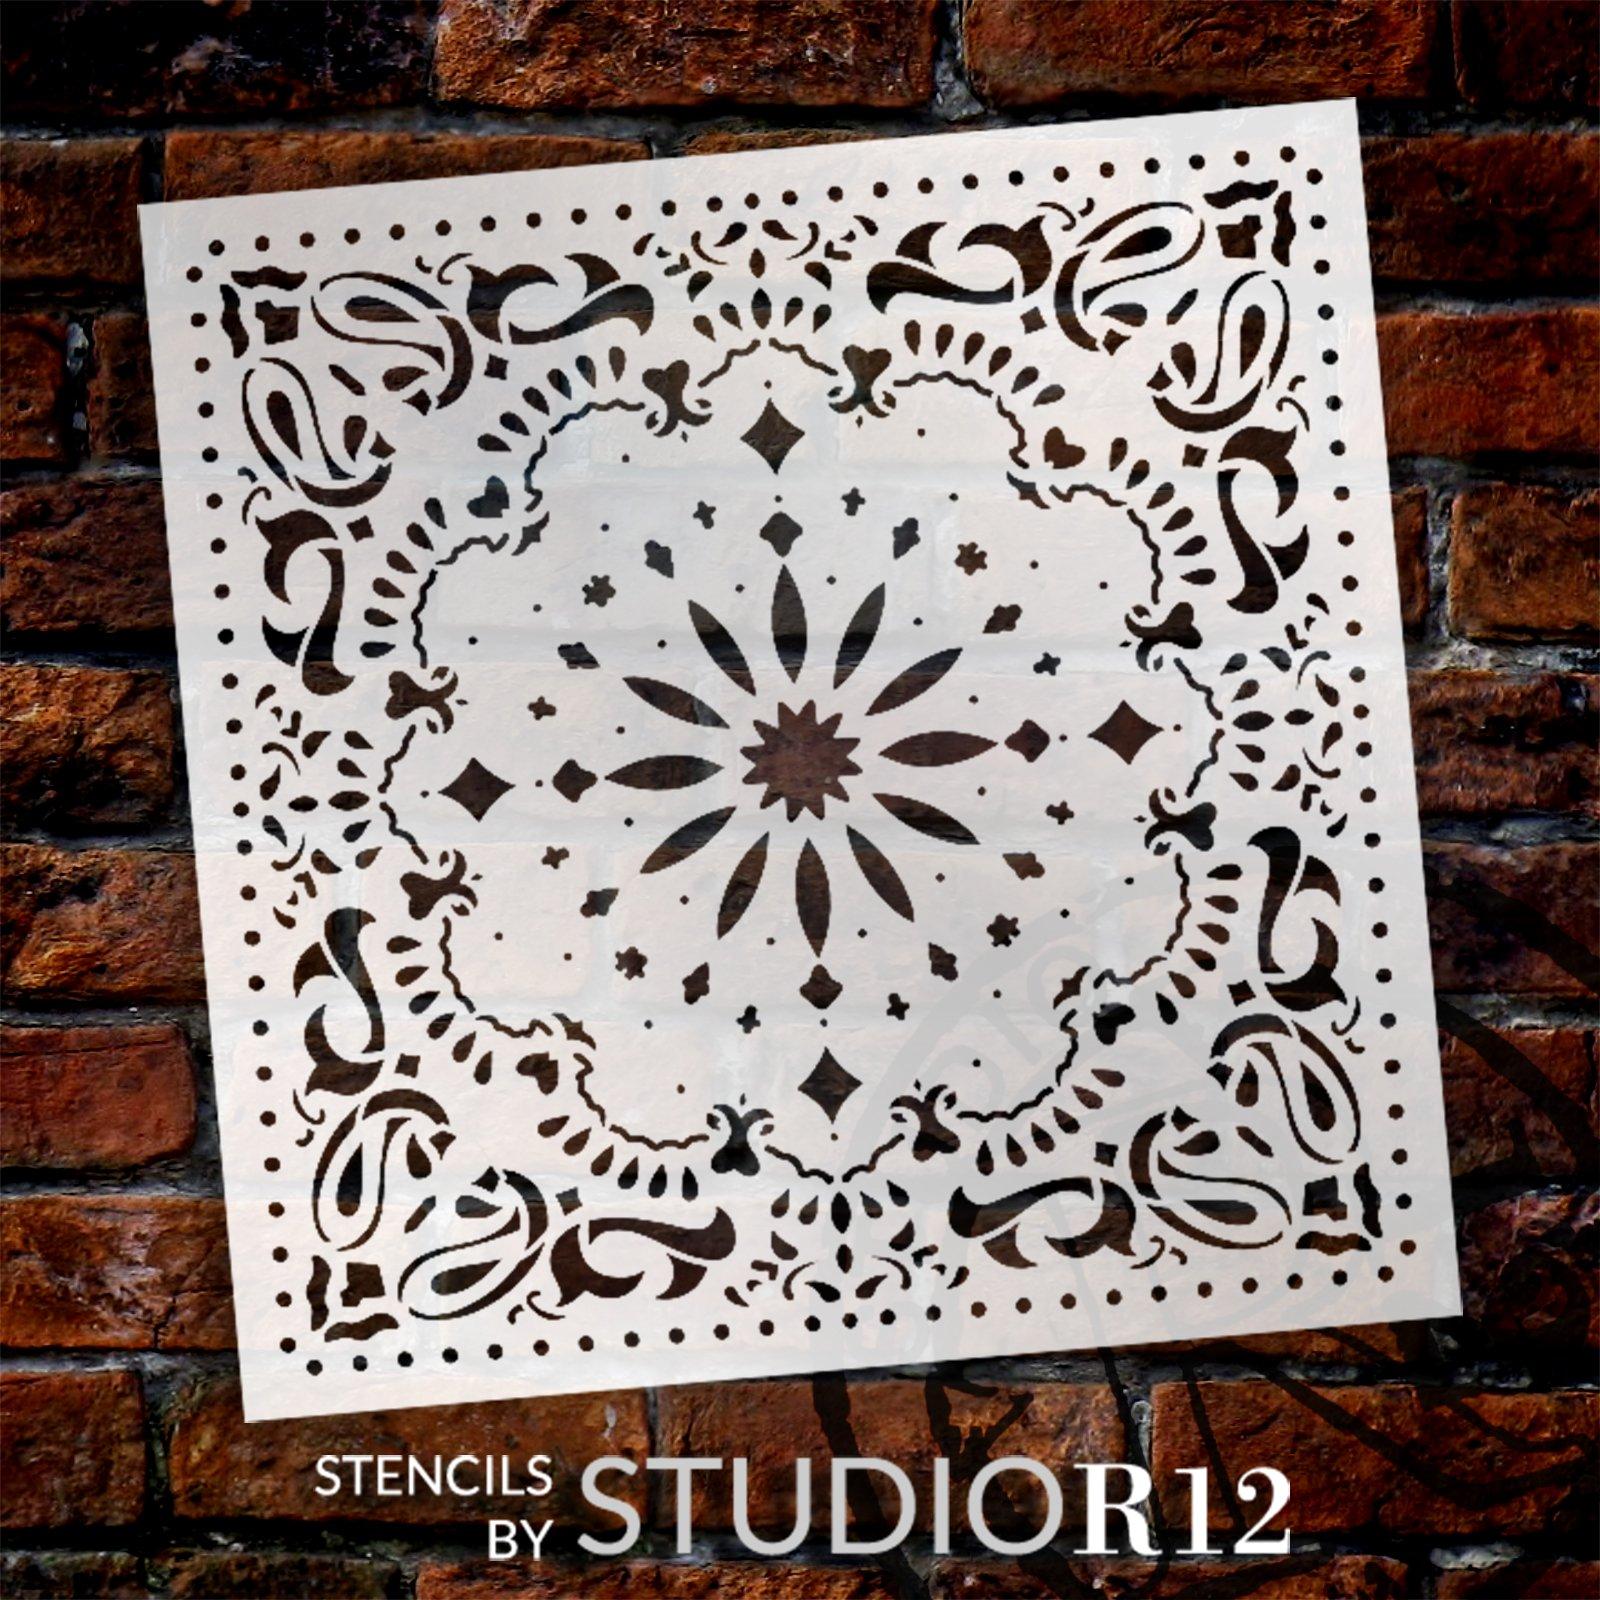 Kaleidoscope Paisley Stencil by StudioR12 | Craft DIY Backsplash Home Decor | Paint Pattern Wood Sign | Reusable Mylar Template | Select Size